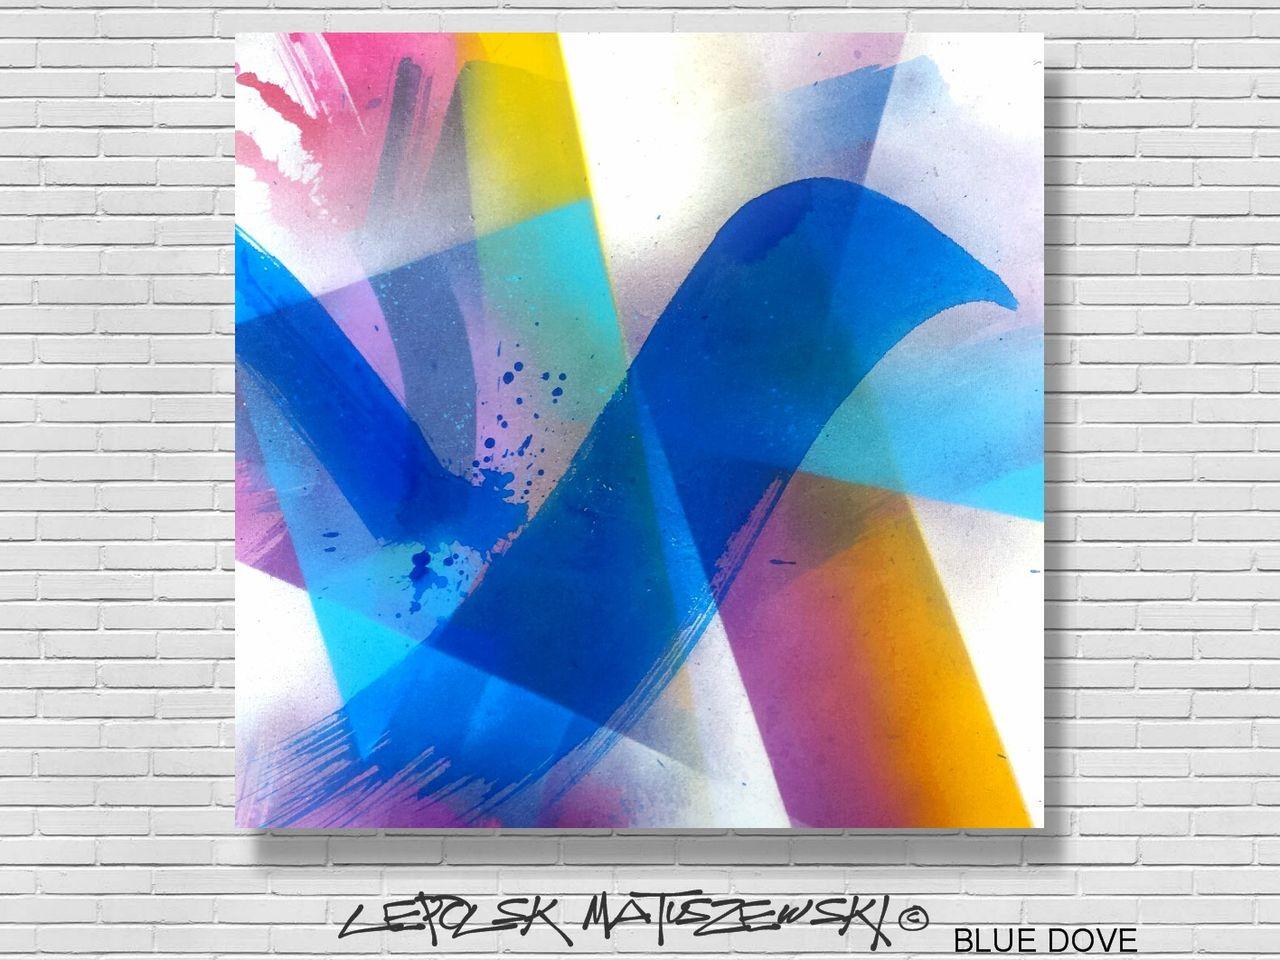 MISTER K  (Lepolsk Matuszewski) BLUE DOVE abstract graffiti expressionism Lepolsk 2016